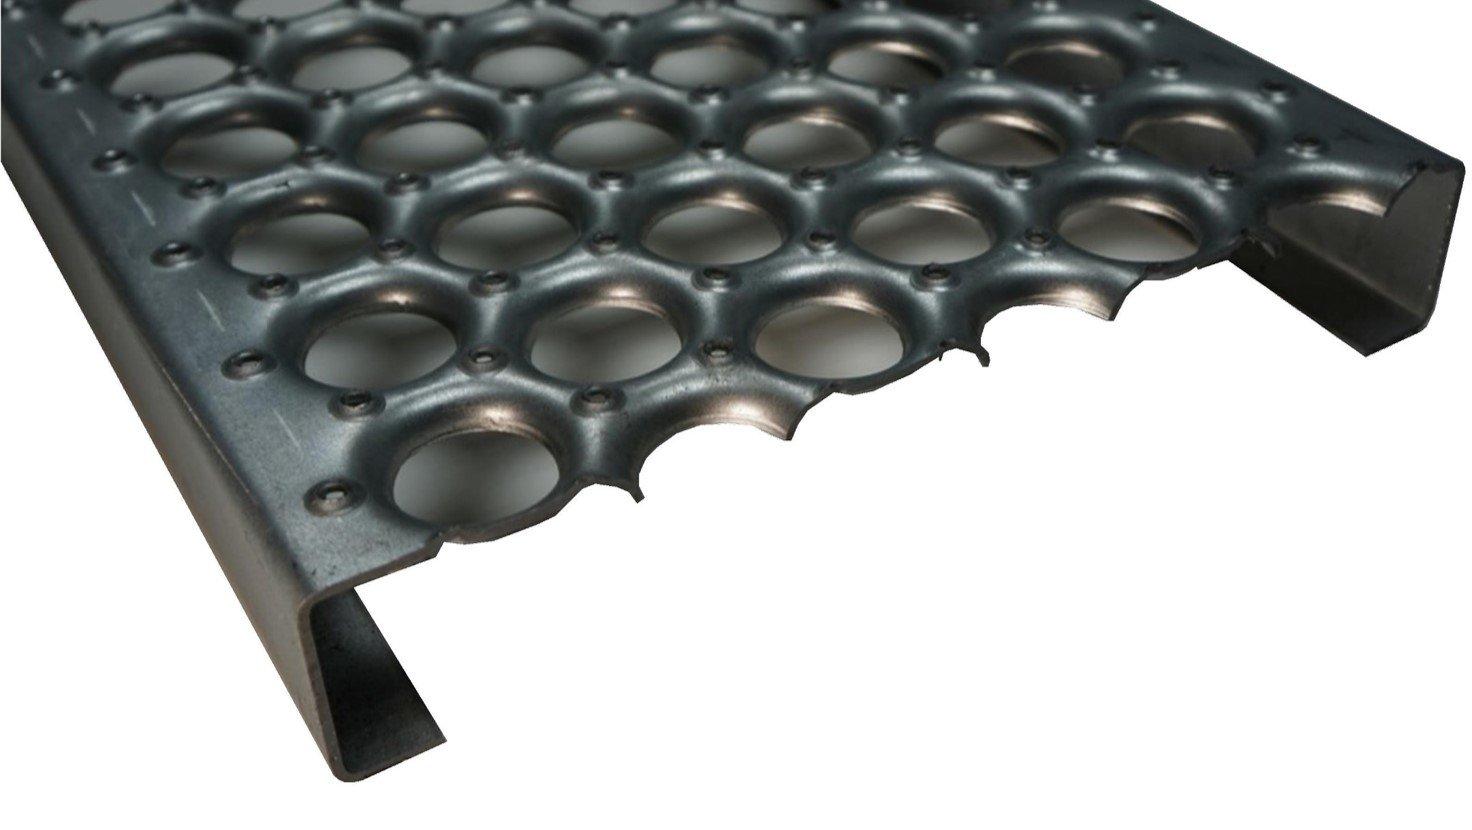 48 Length x 12 Width x 2 Depth 61G13122-48 Perf-O-Grip Channel 13 Gauge Pregalvanized Steel Plank Safety Grating